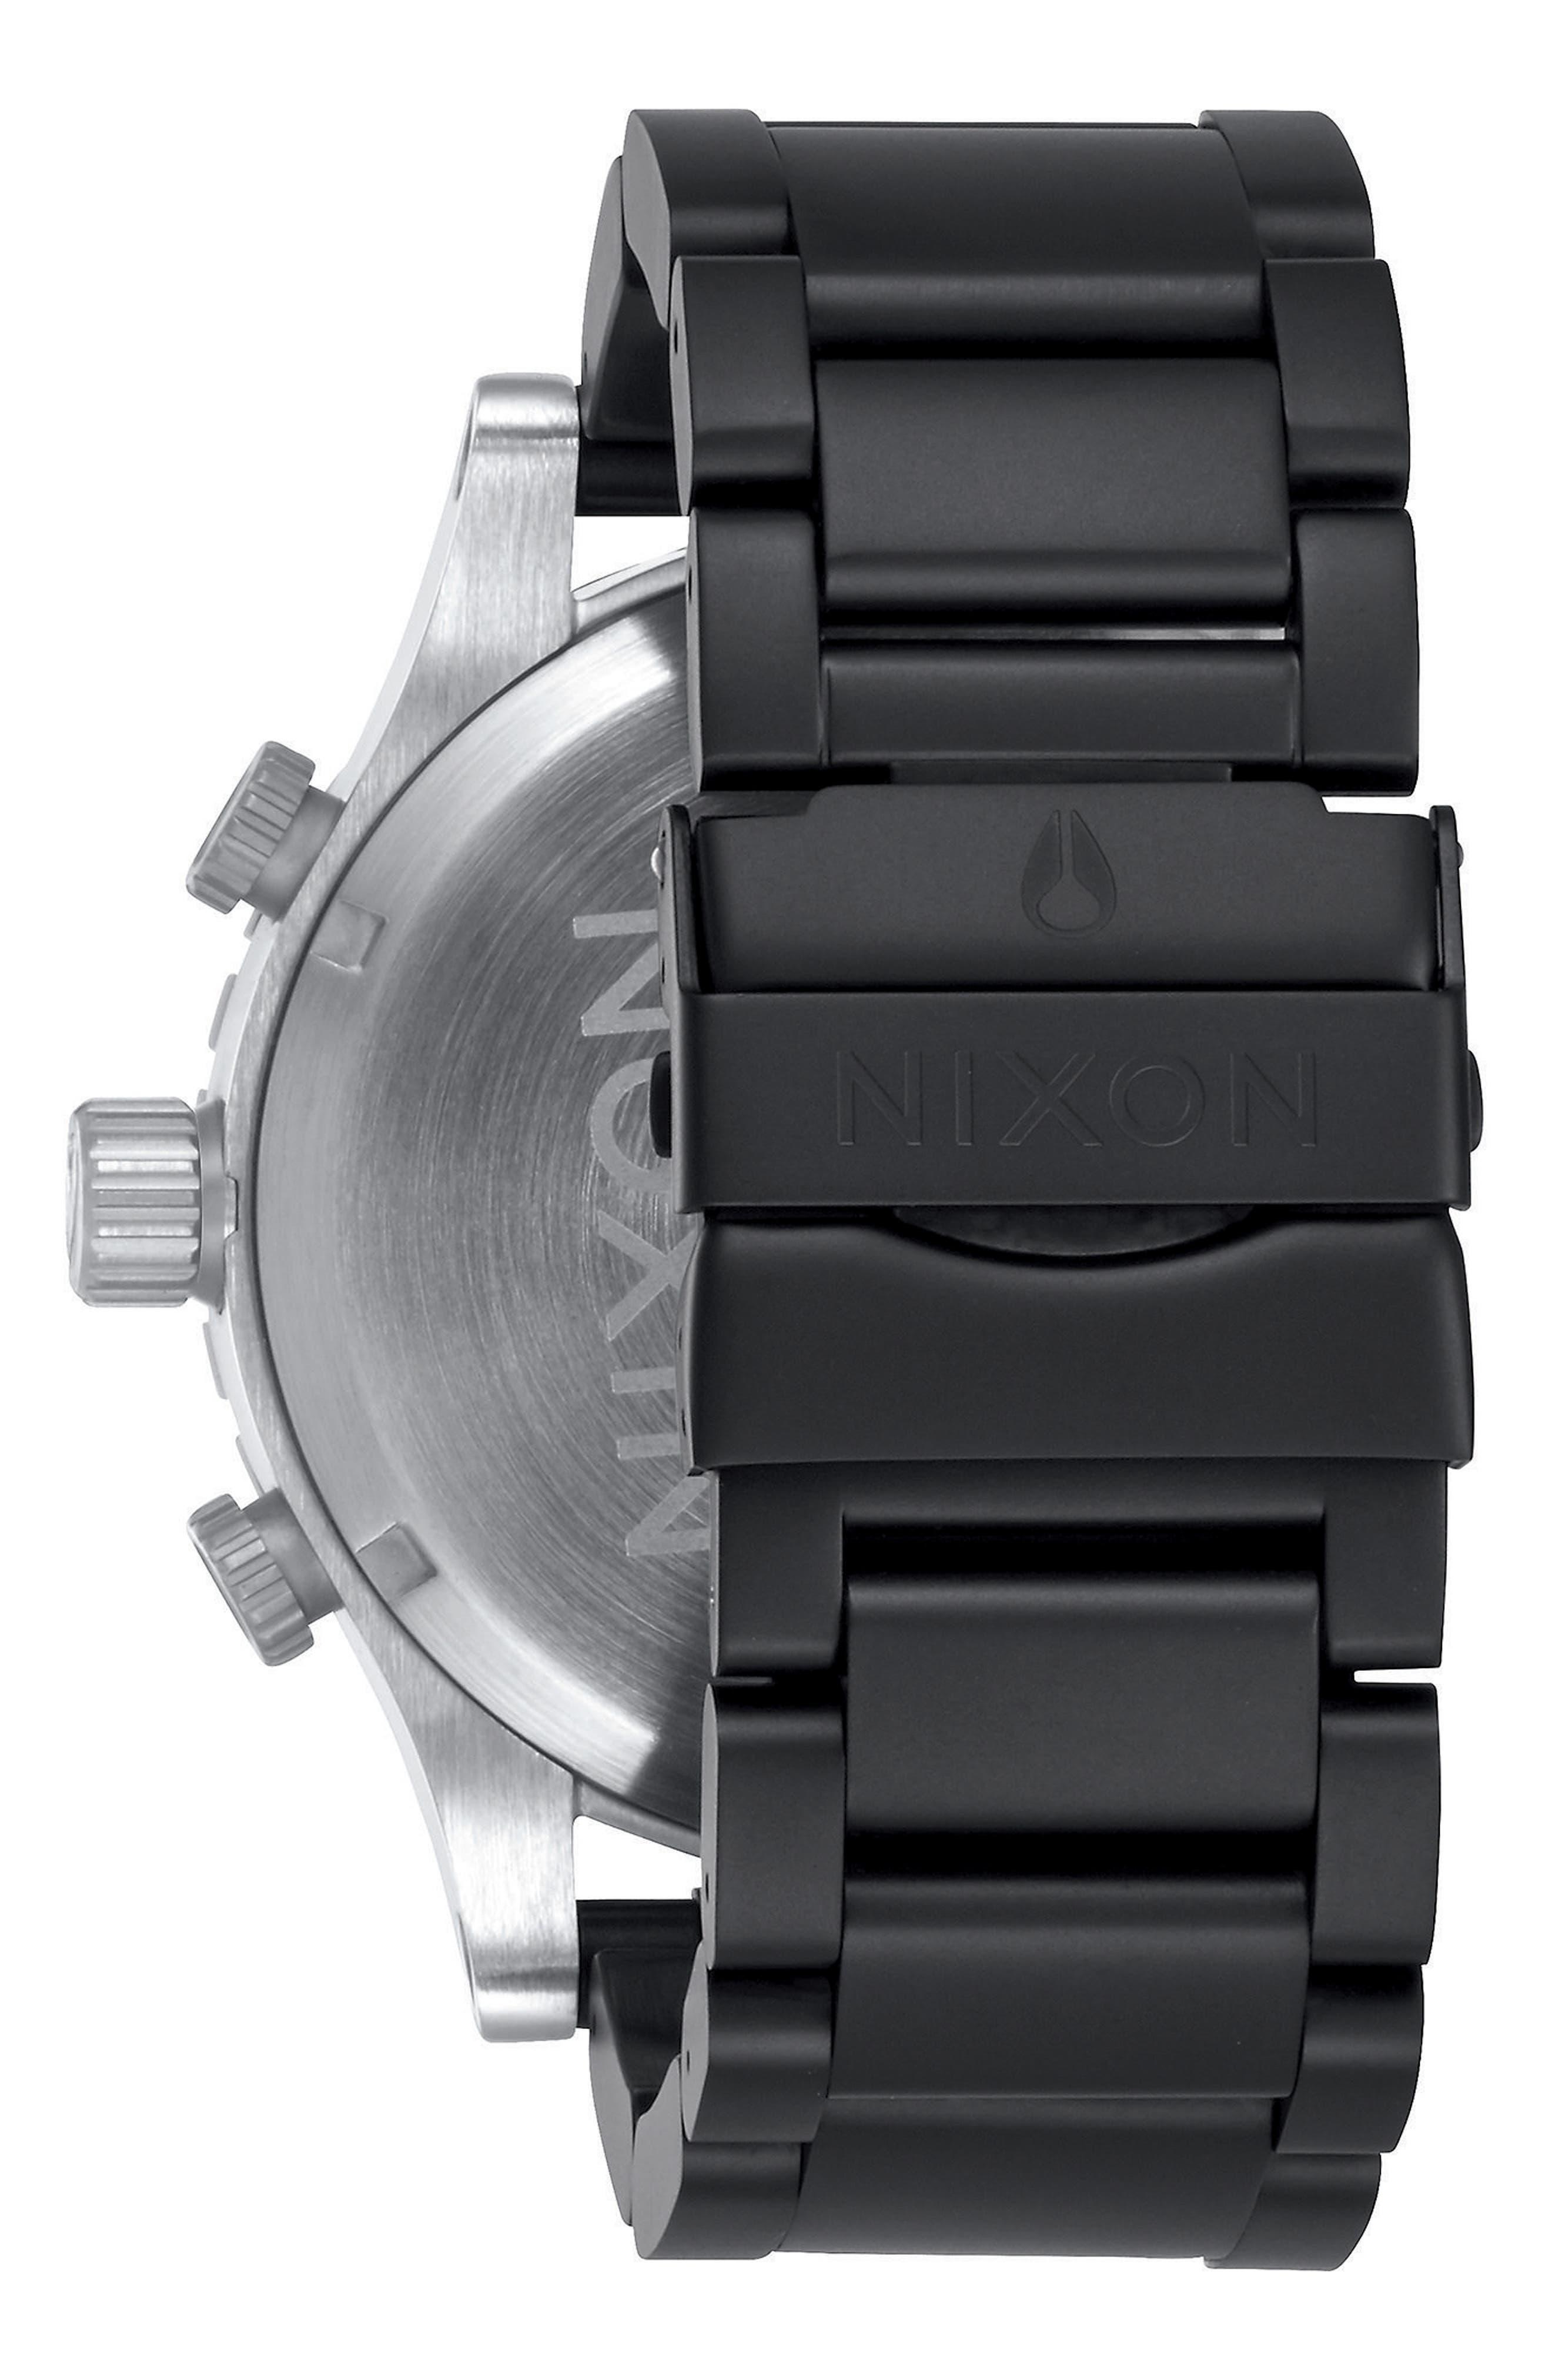 Alternate Image 2  - Nixon 51-30 Chronograph Watch, 51mm